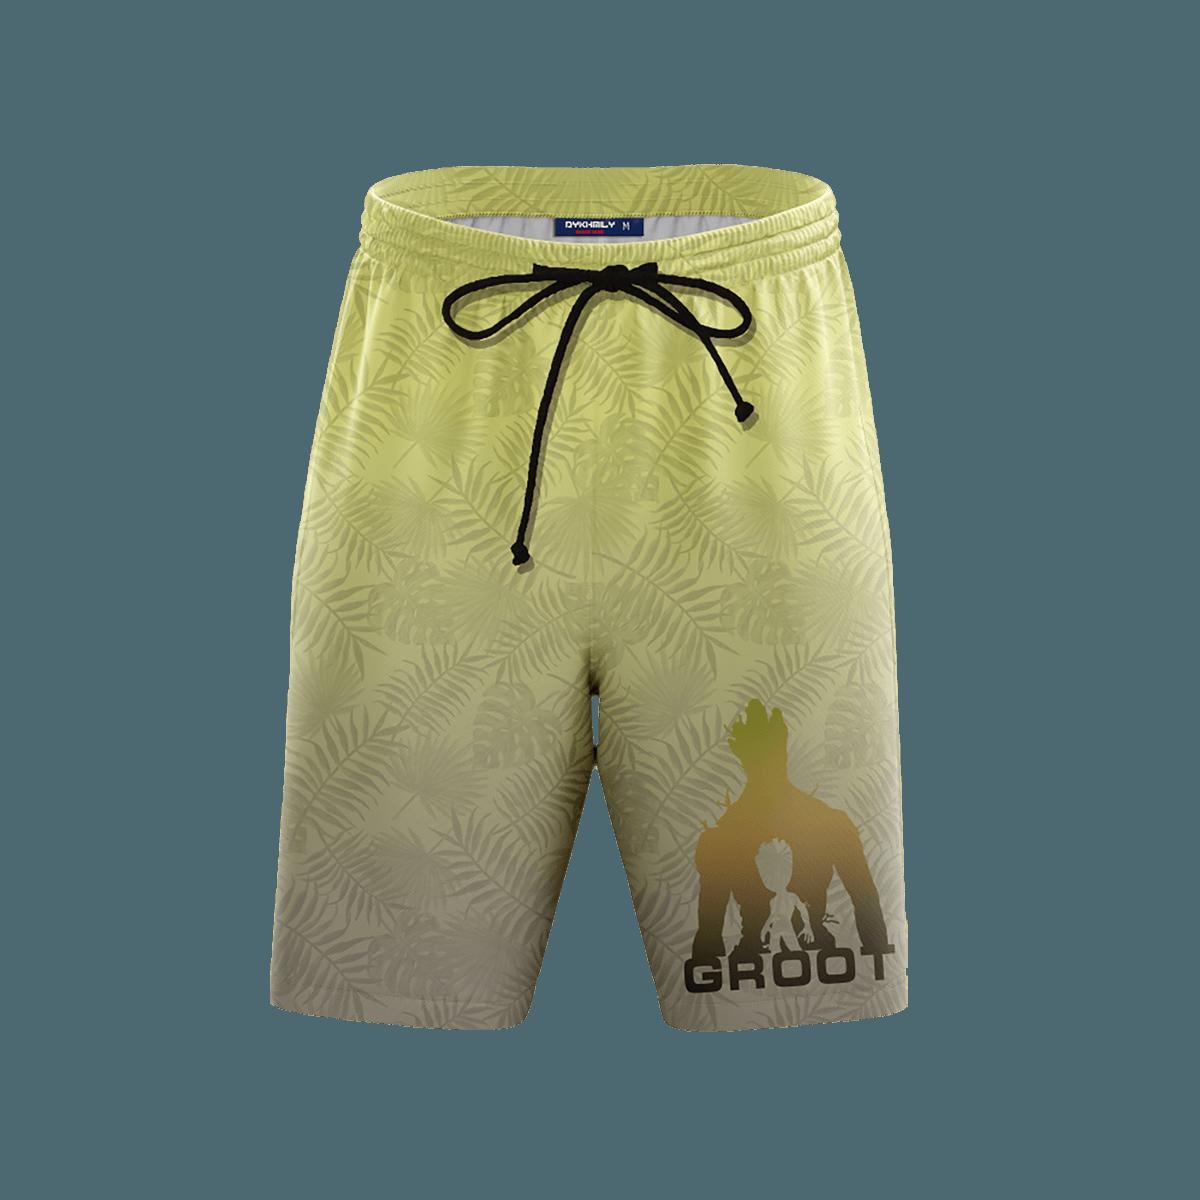 Guardian Groot Beach Shorts FDM3107 S Official Anime Swimsuit Merch